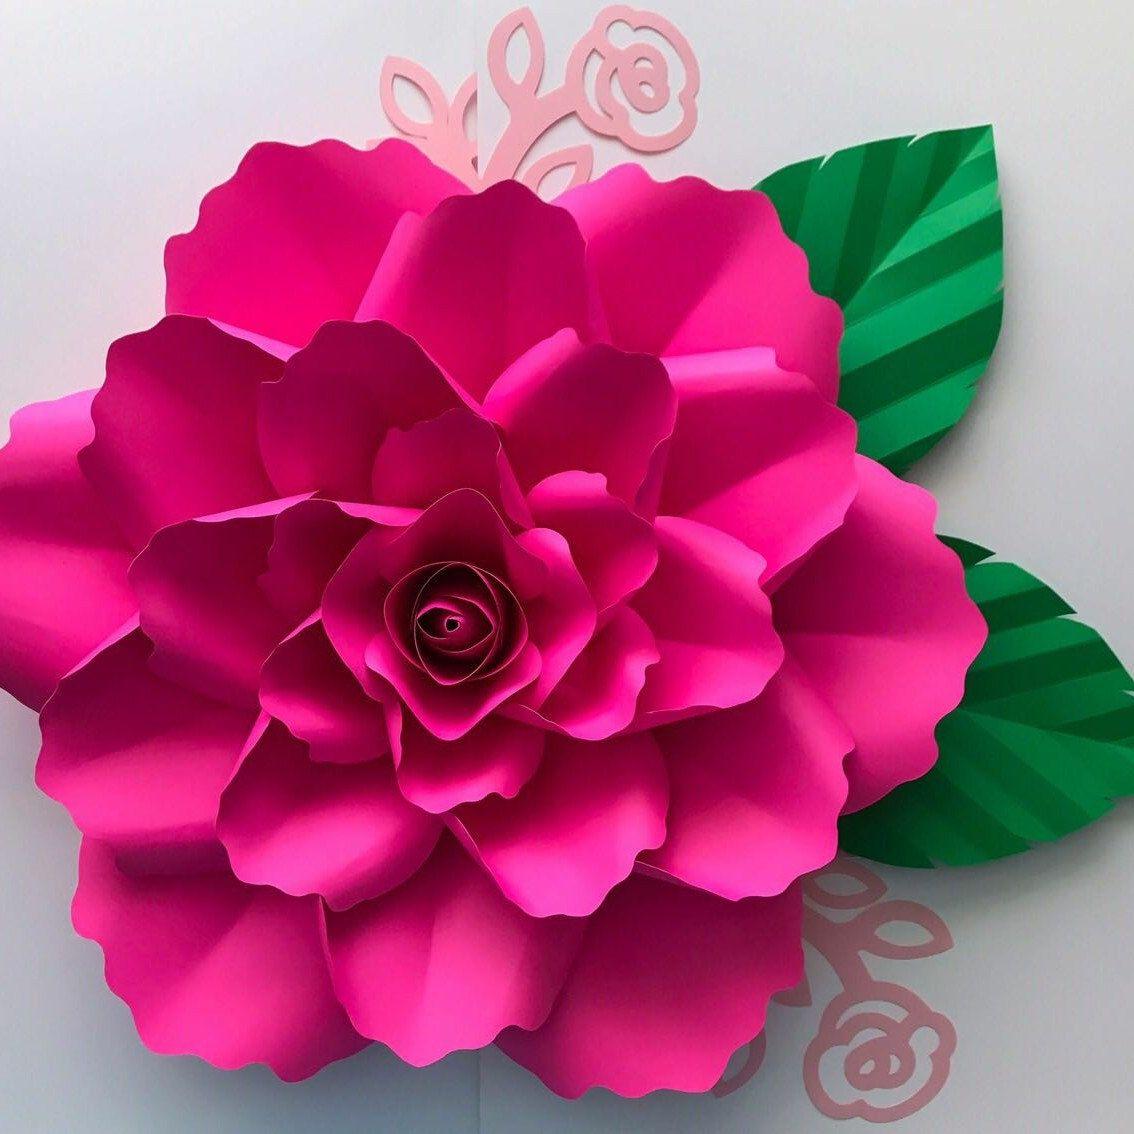 Pdf petal 140 paper flower template digital version original pdf petal 140 paper flower template digital version original design by annie rose pronofoot35fo Choice Image